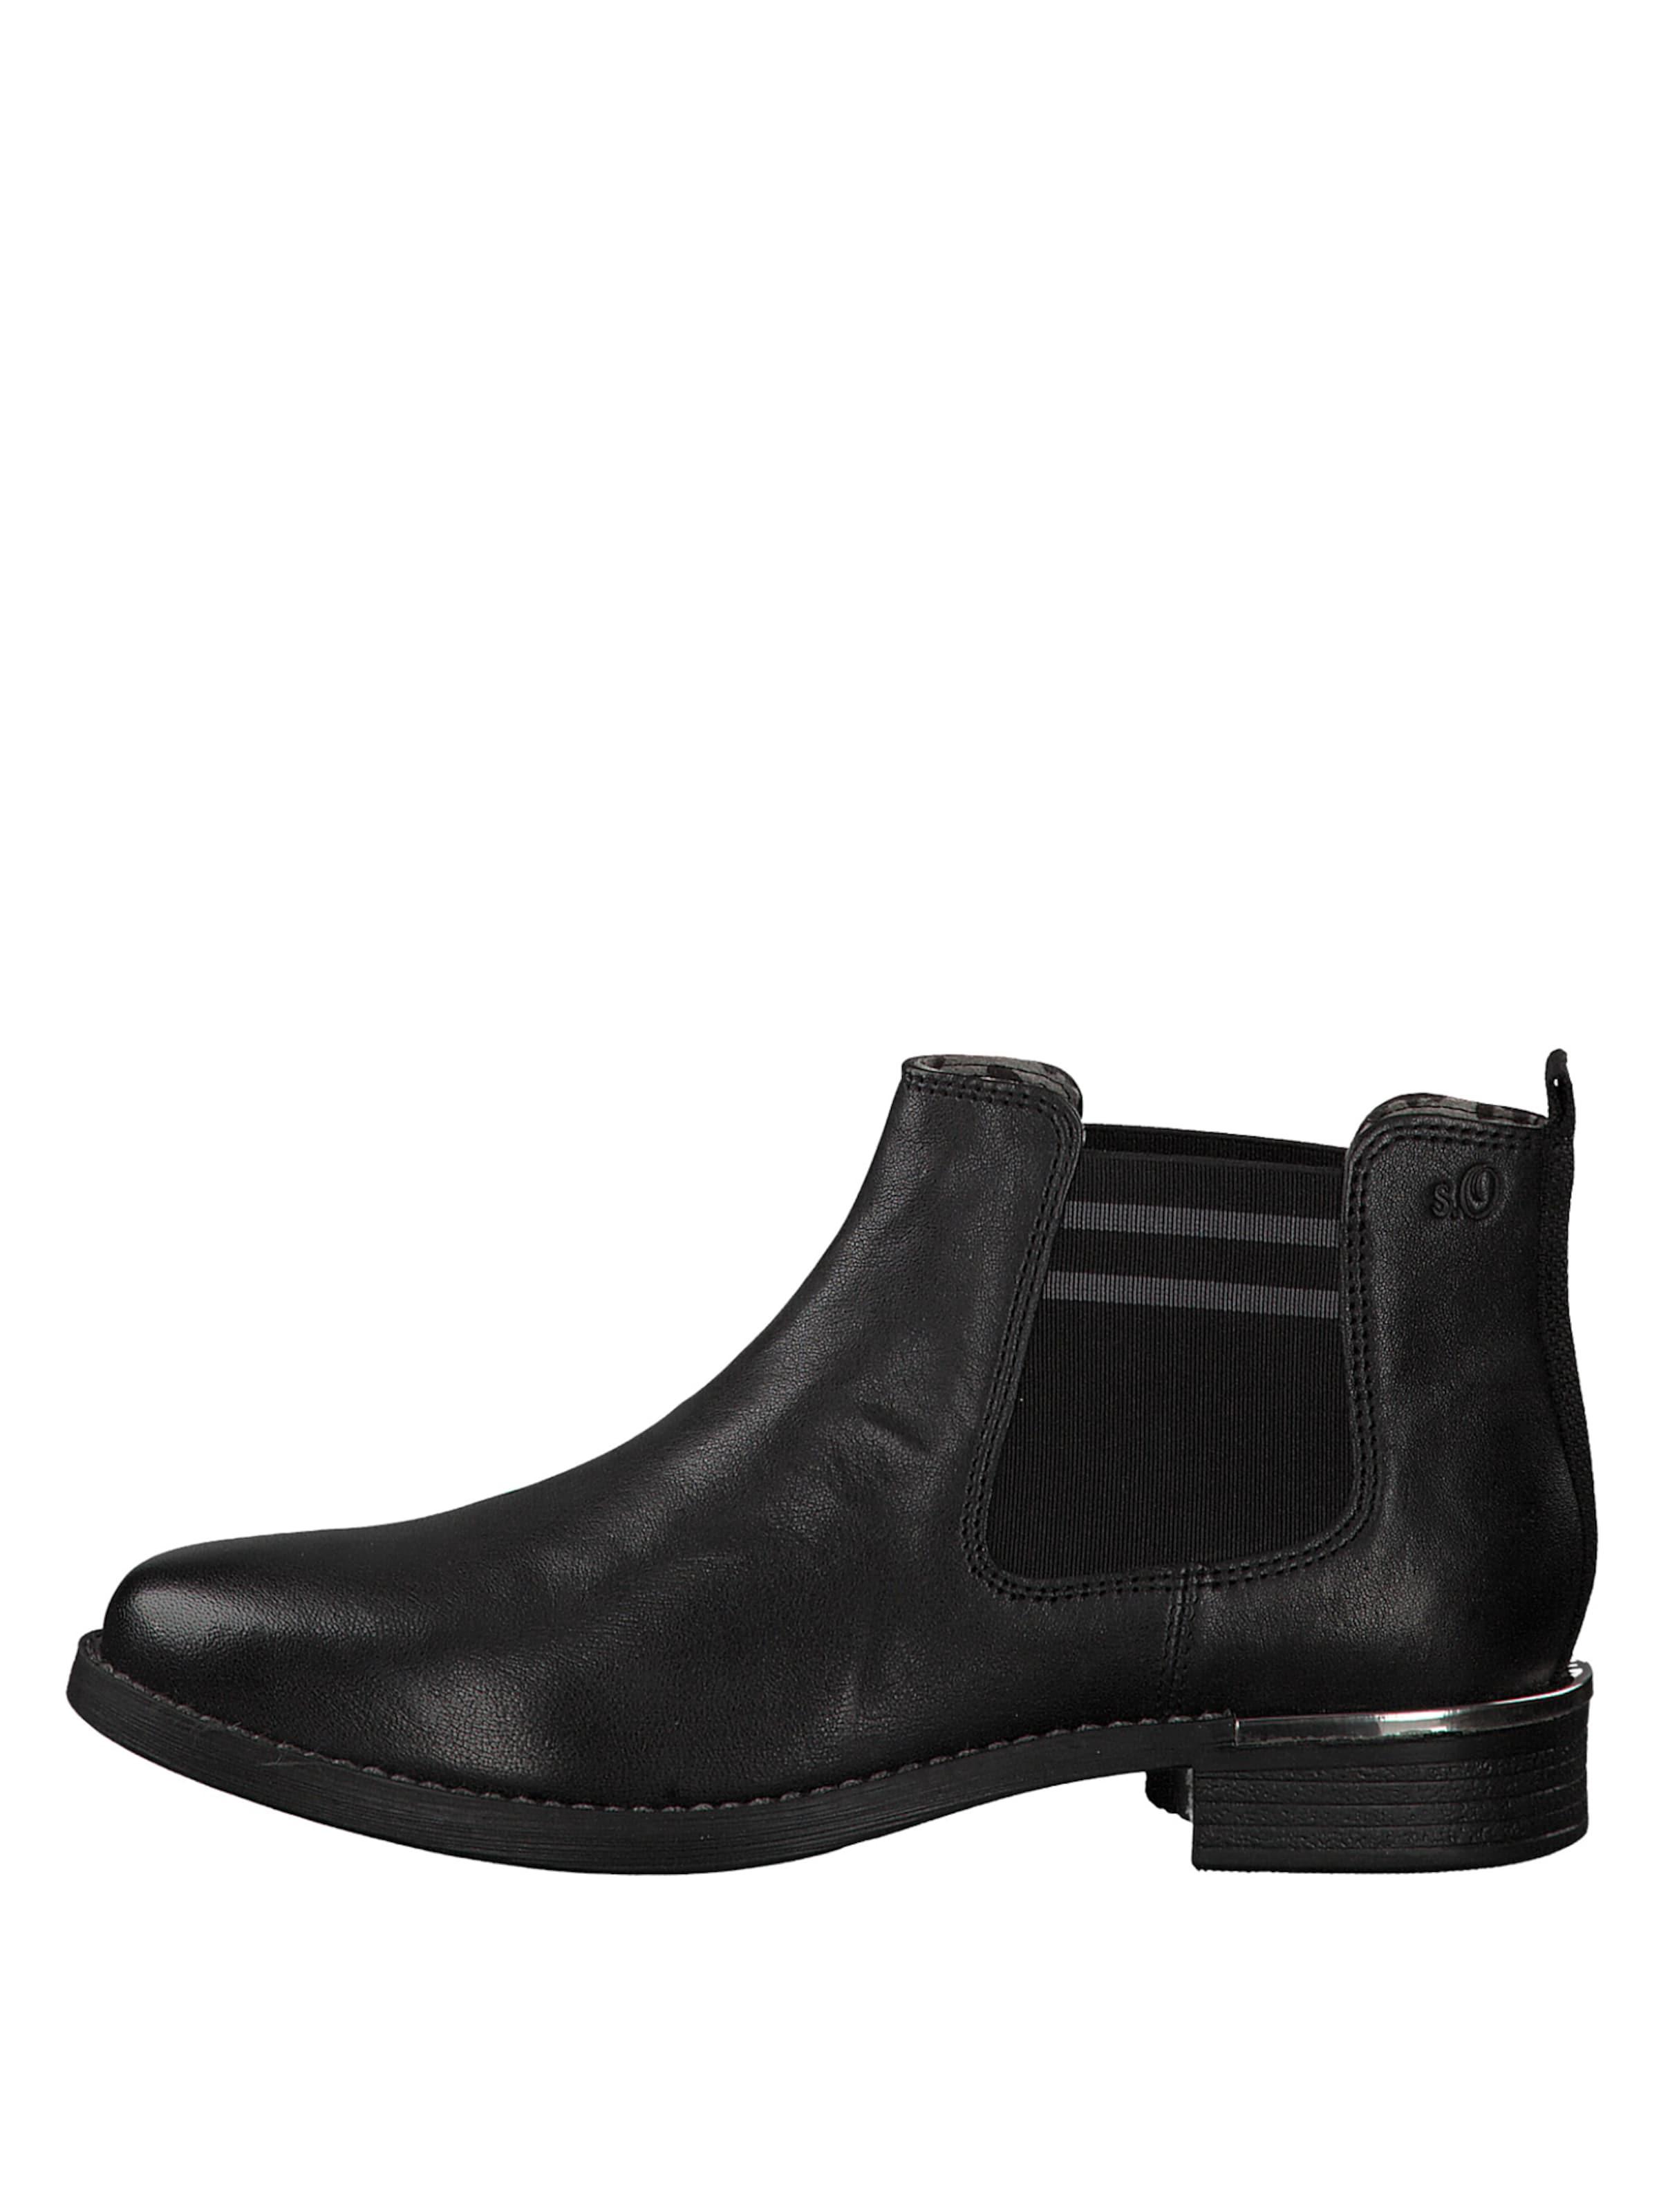 Red Label Boots Noir S Chelsea En oliver DbeH9WEIY2